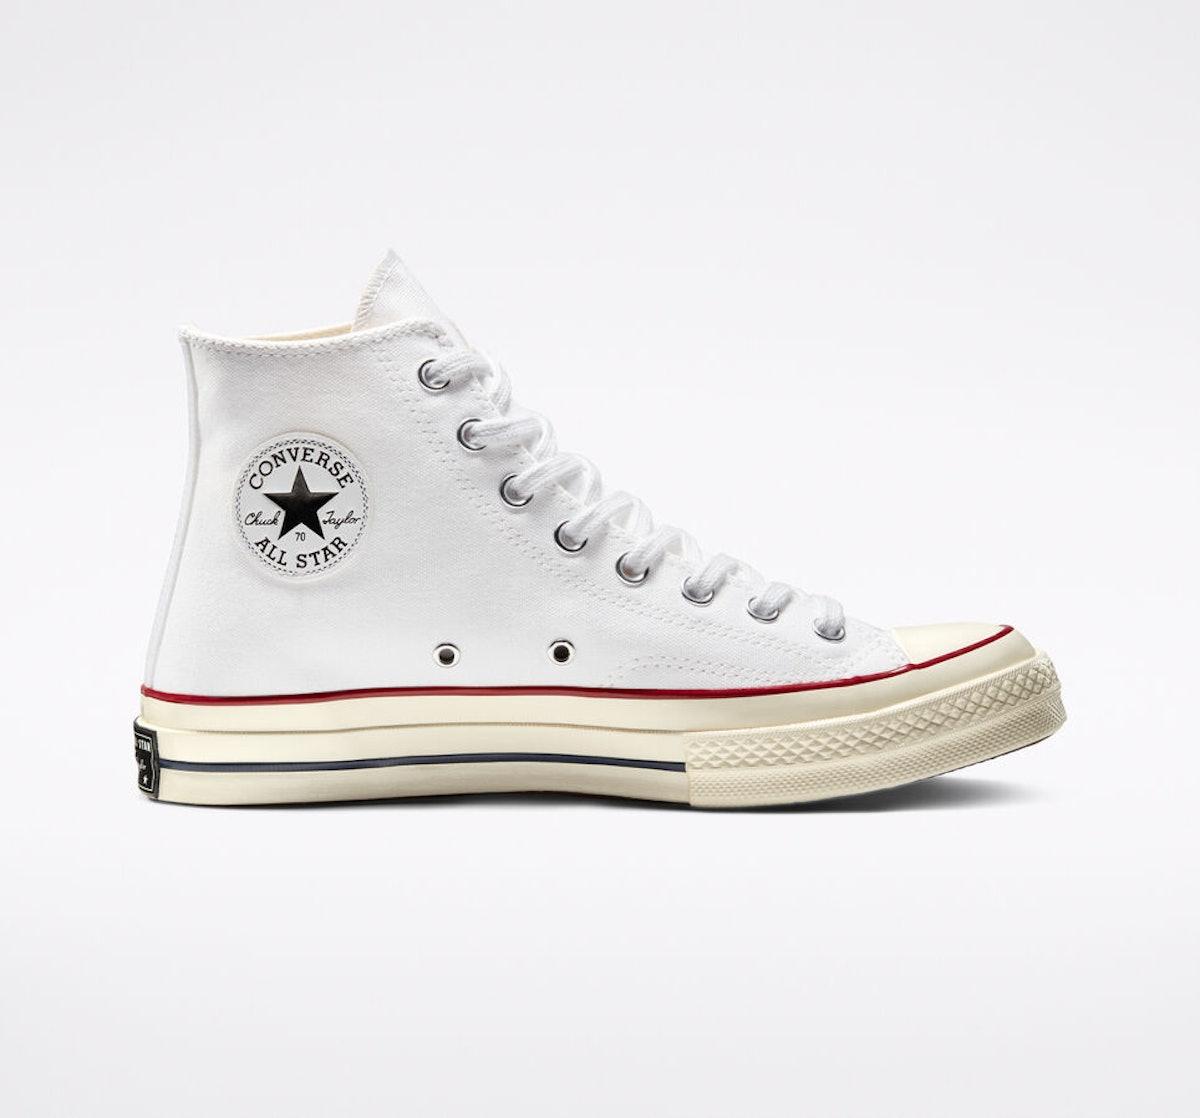 Chuck 70 Unisex High Top Shoes